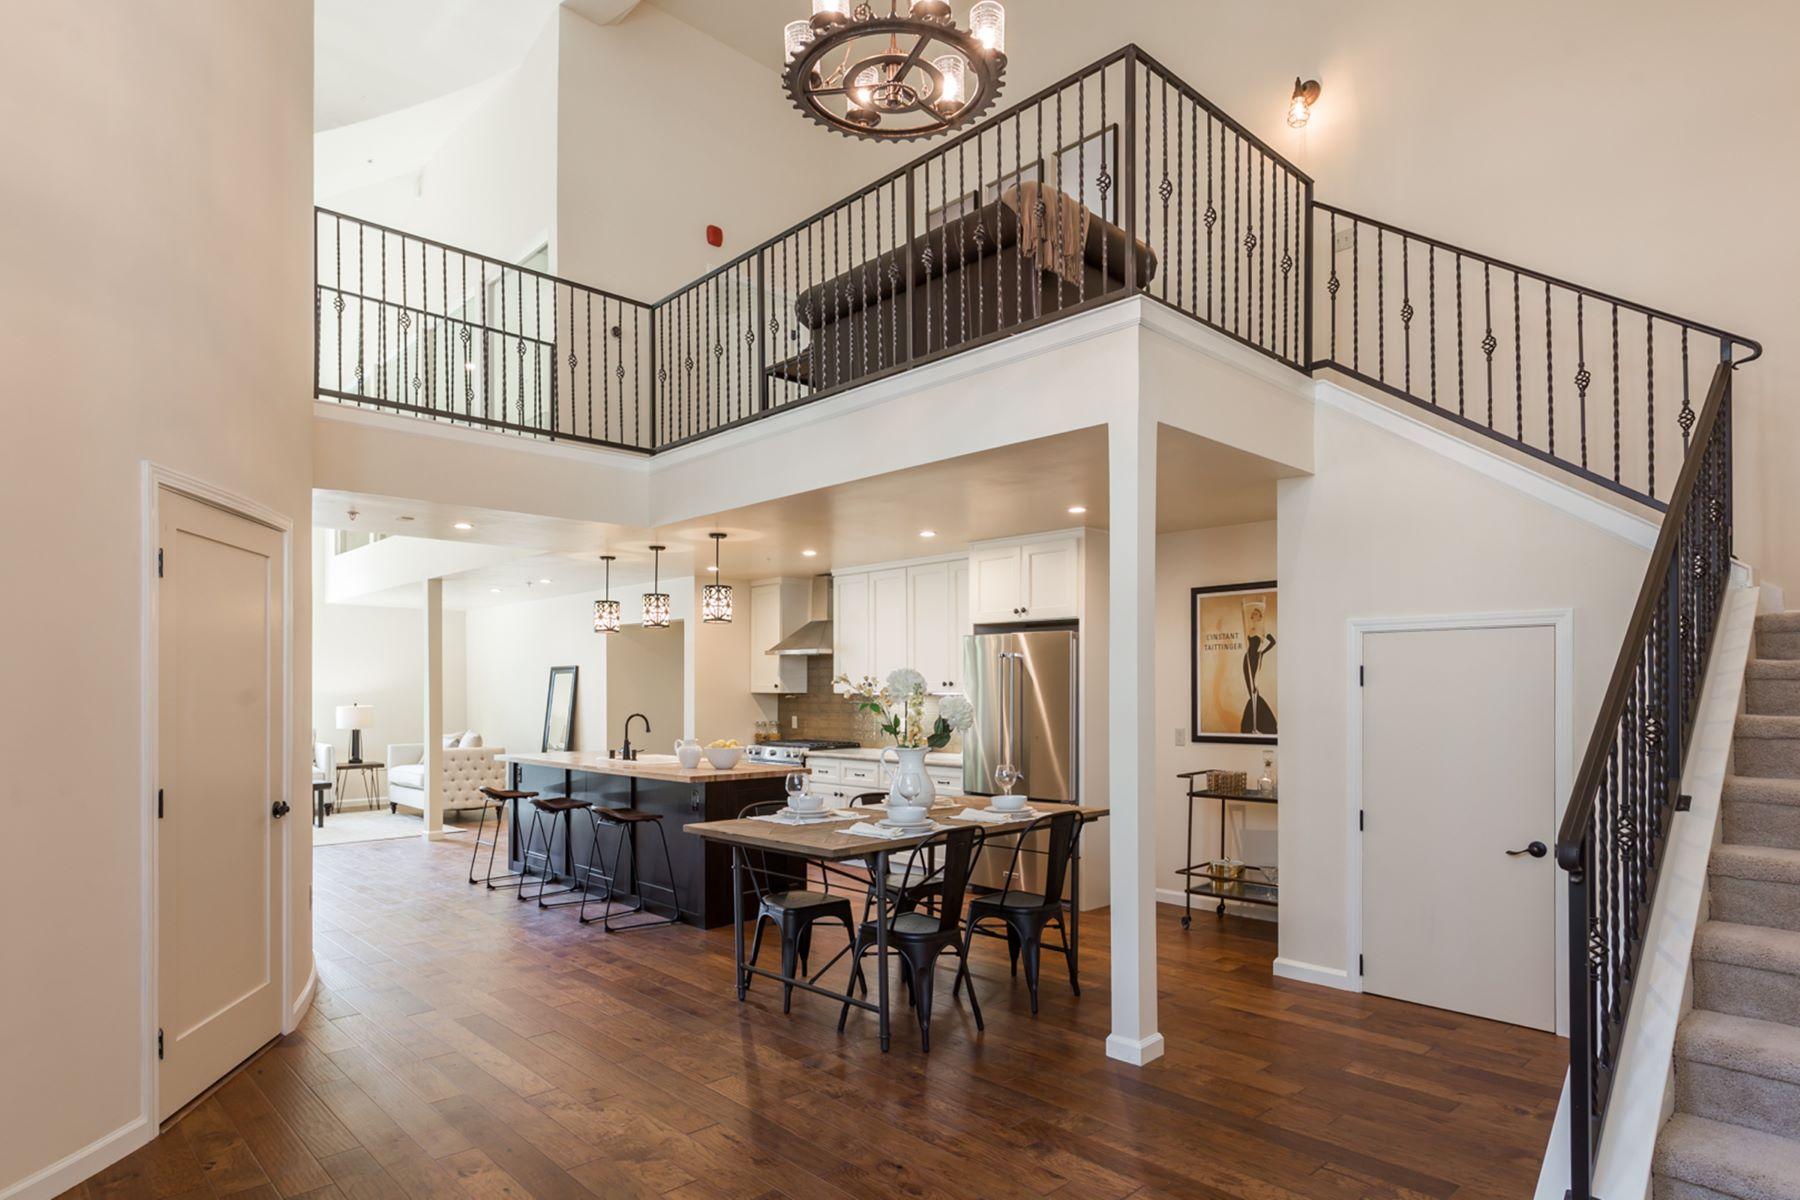 Condominium for Sale at Brand New Condos - Luxury Living 6300 Shattuck Avenue #2 Oakland, California 94609 United States